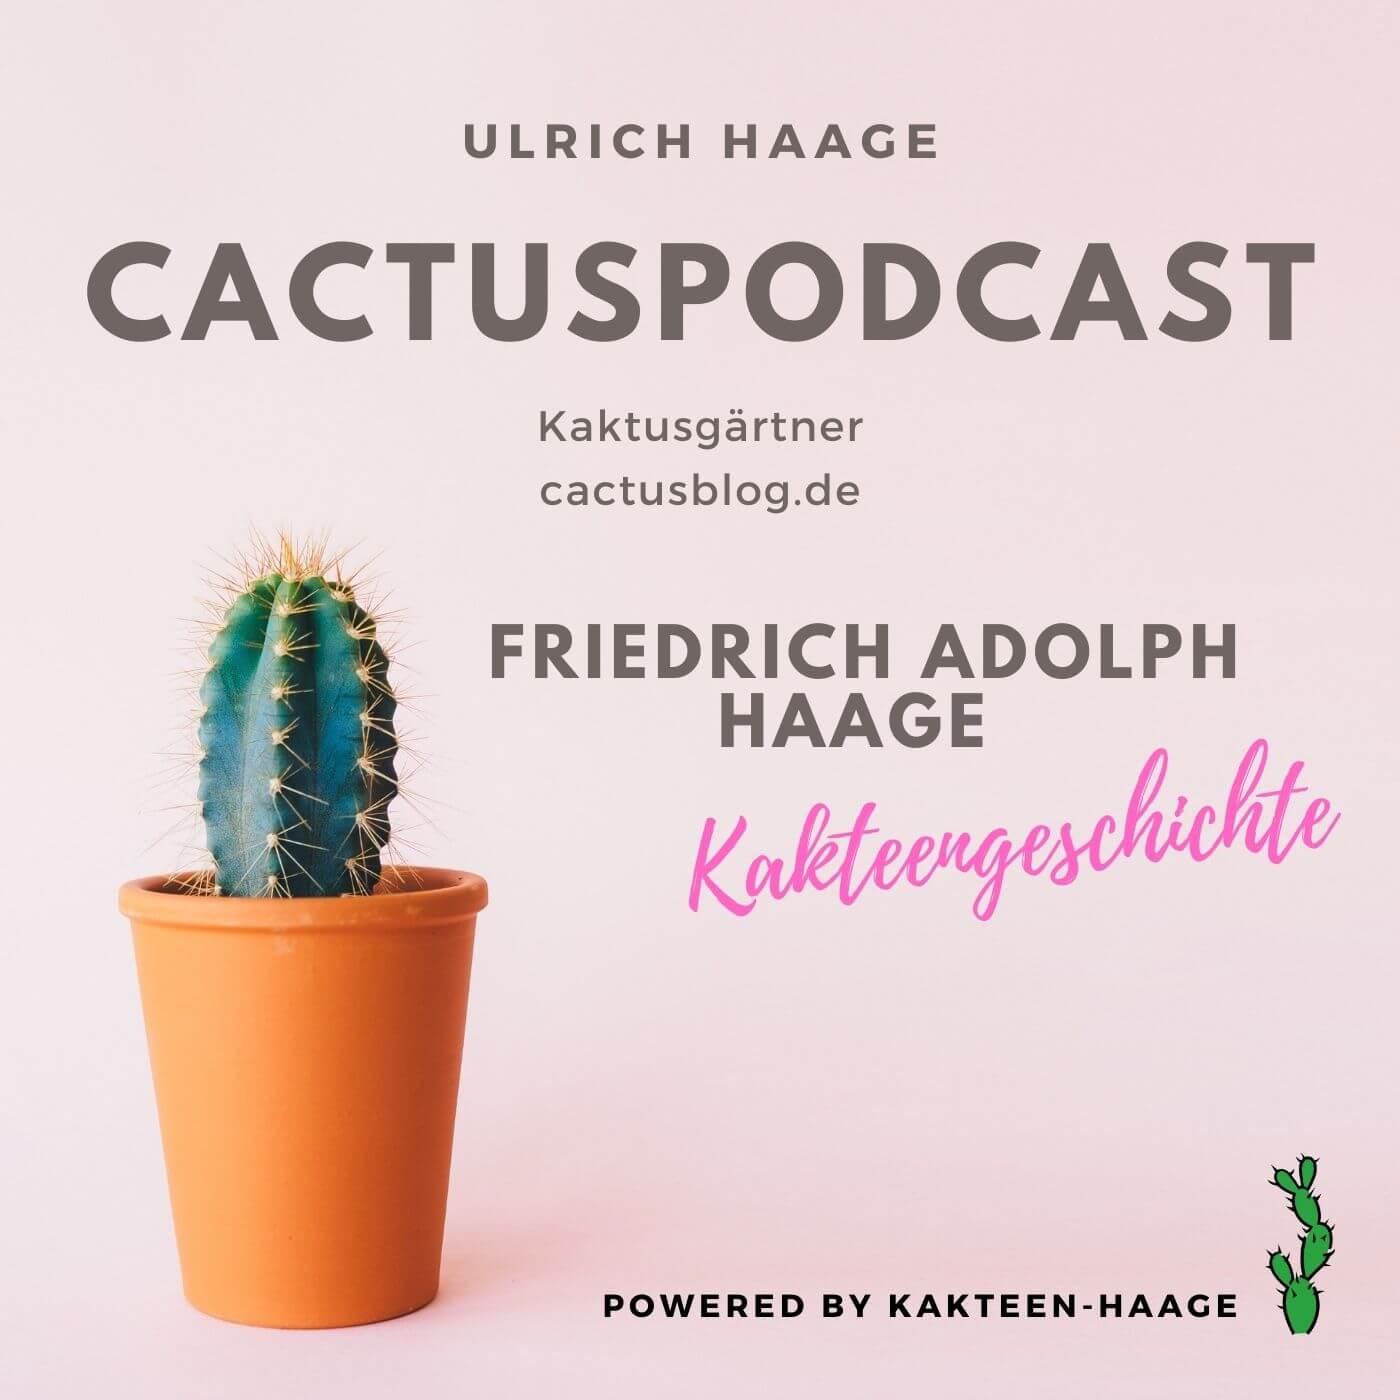 CactusPodcast Friedrich Adolph Haage